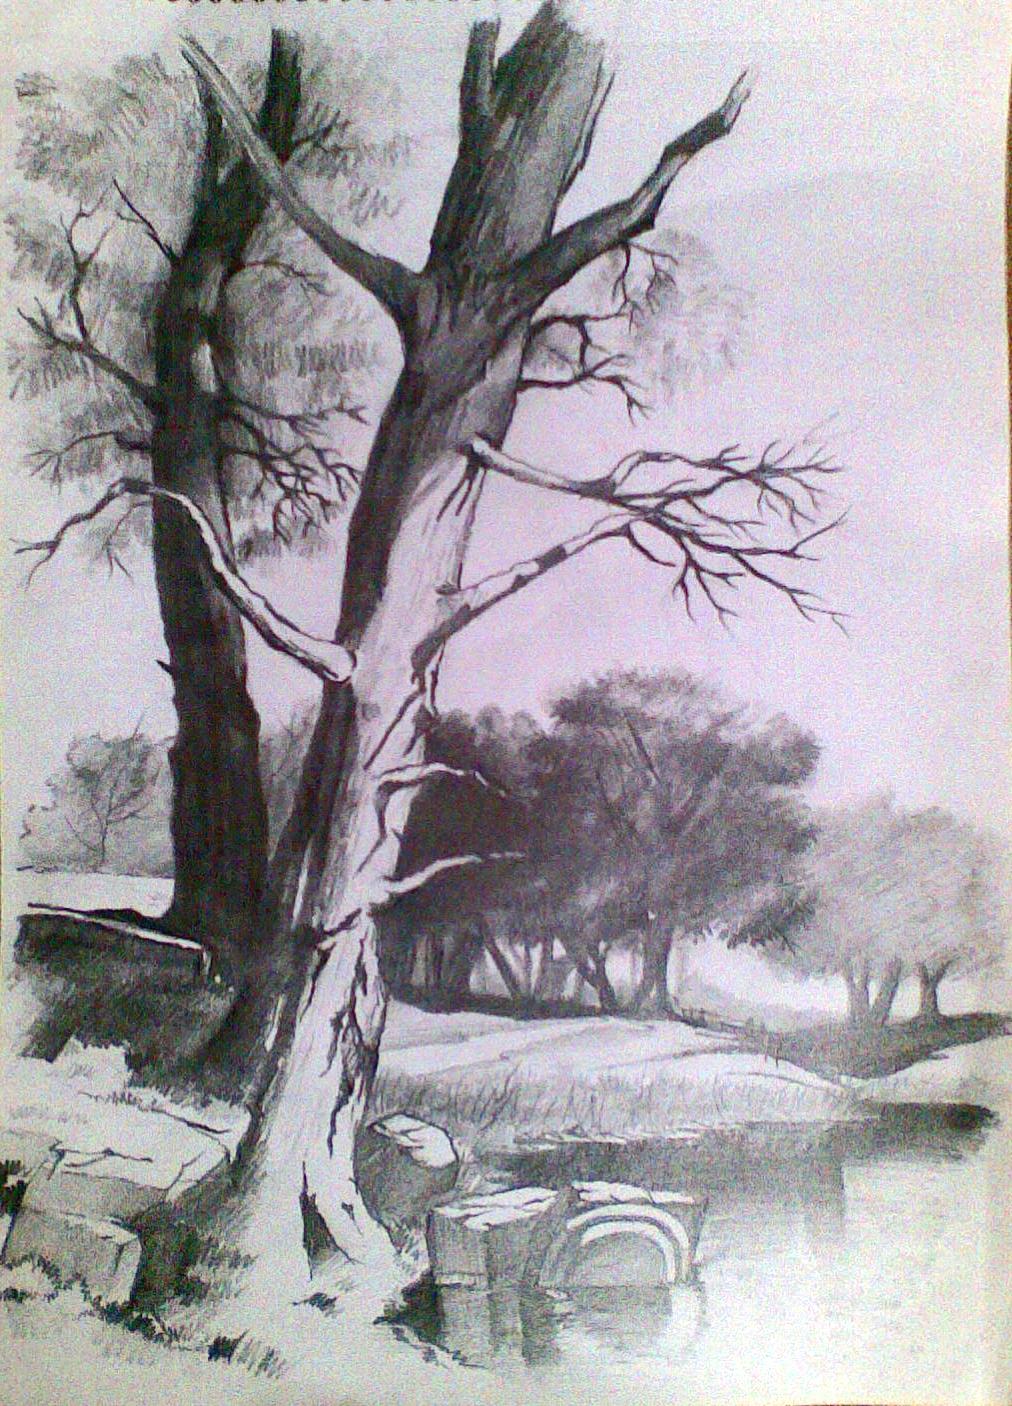 1012x1406 Art Scenery Pencil Sketches Pencil Drawings Of Fall Scenes Hd